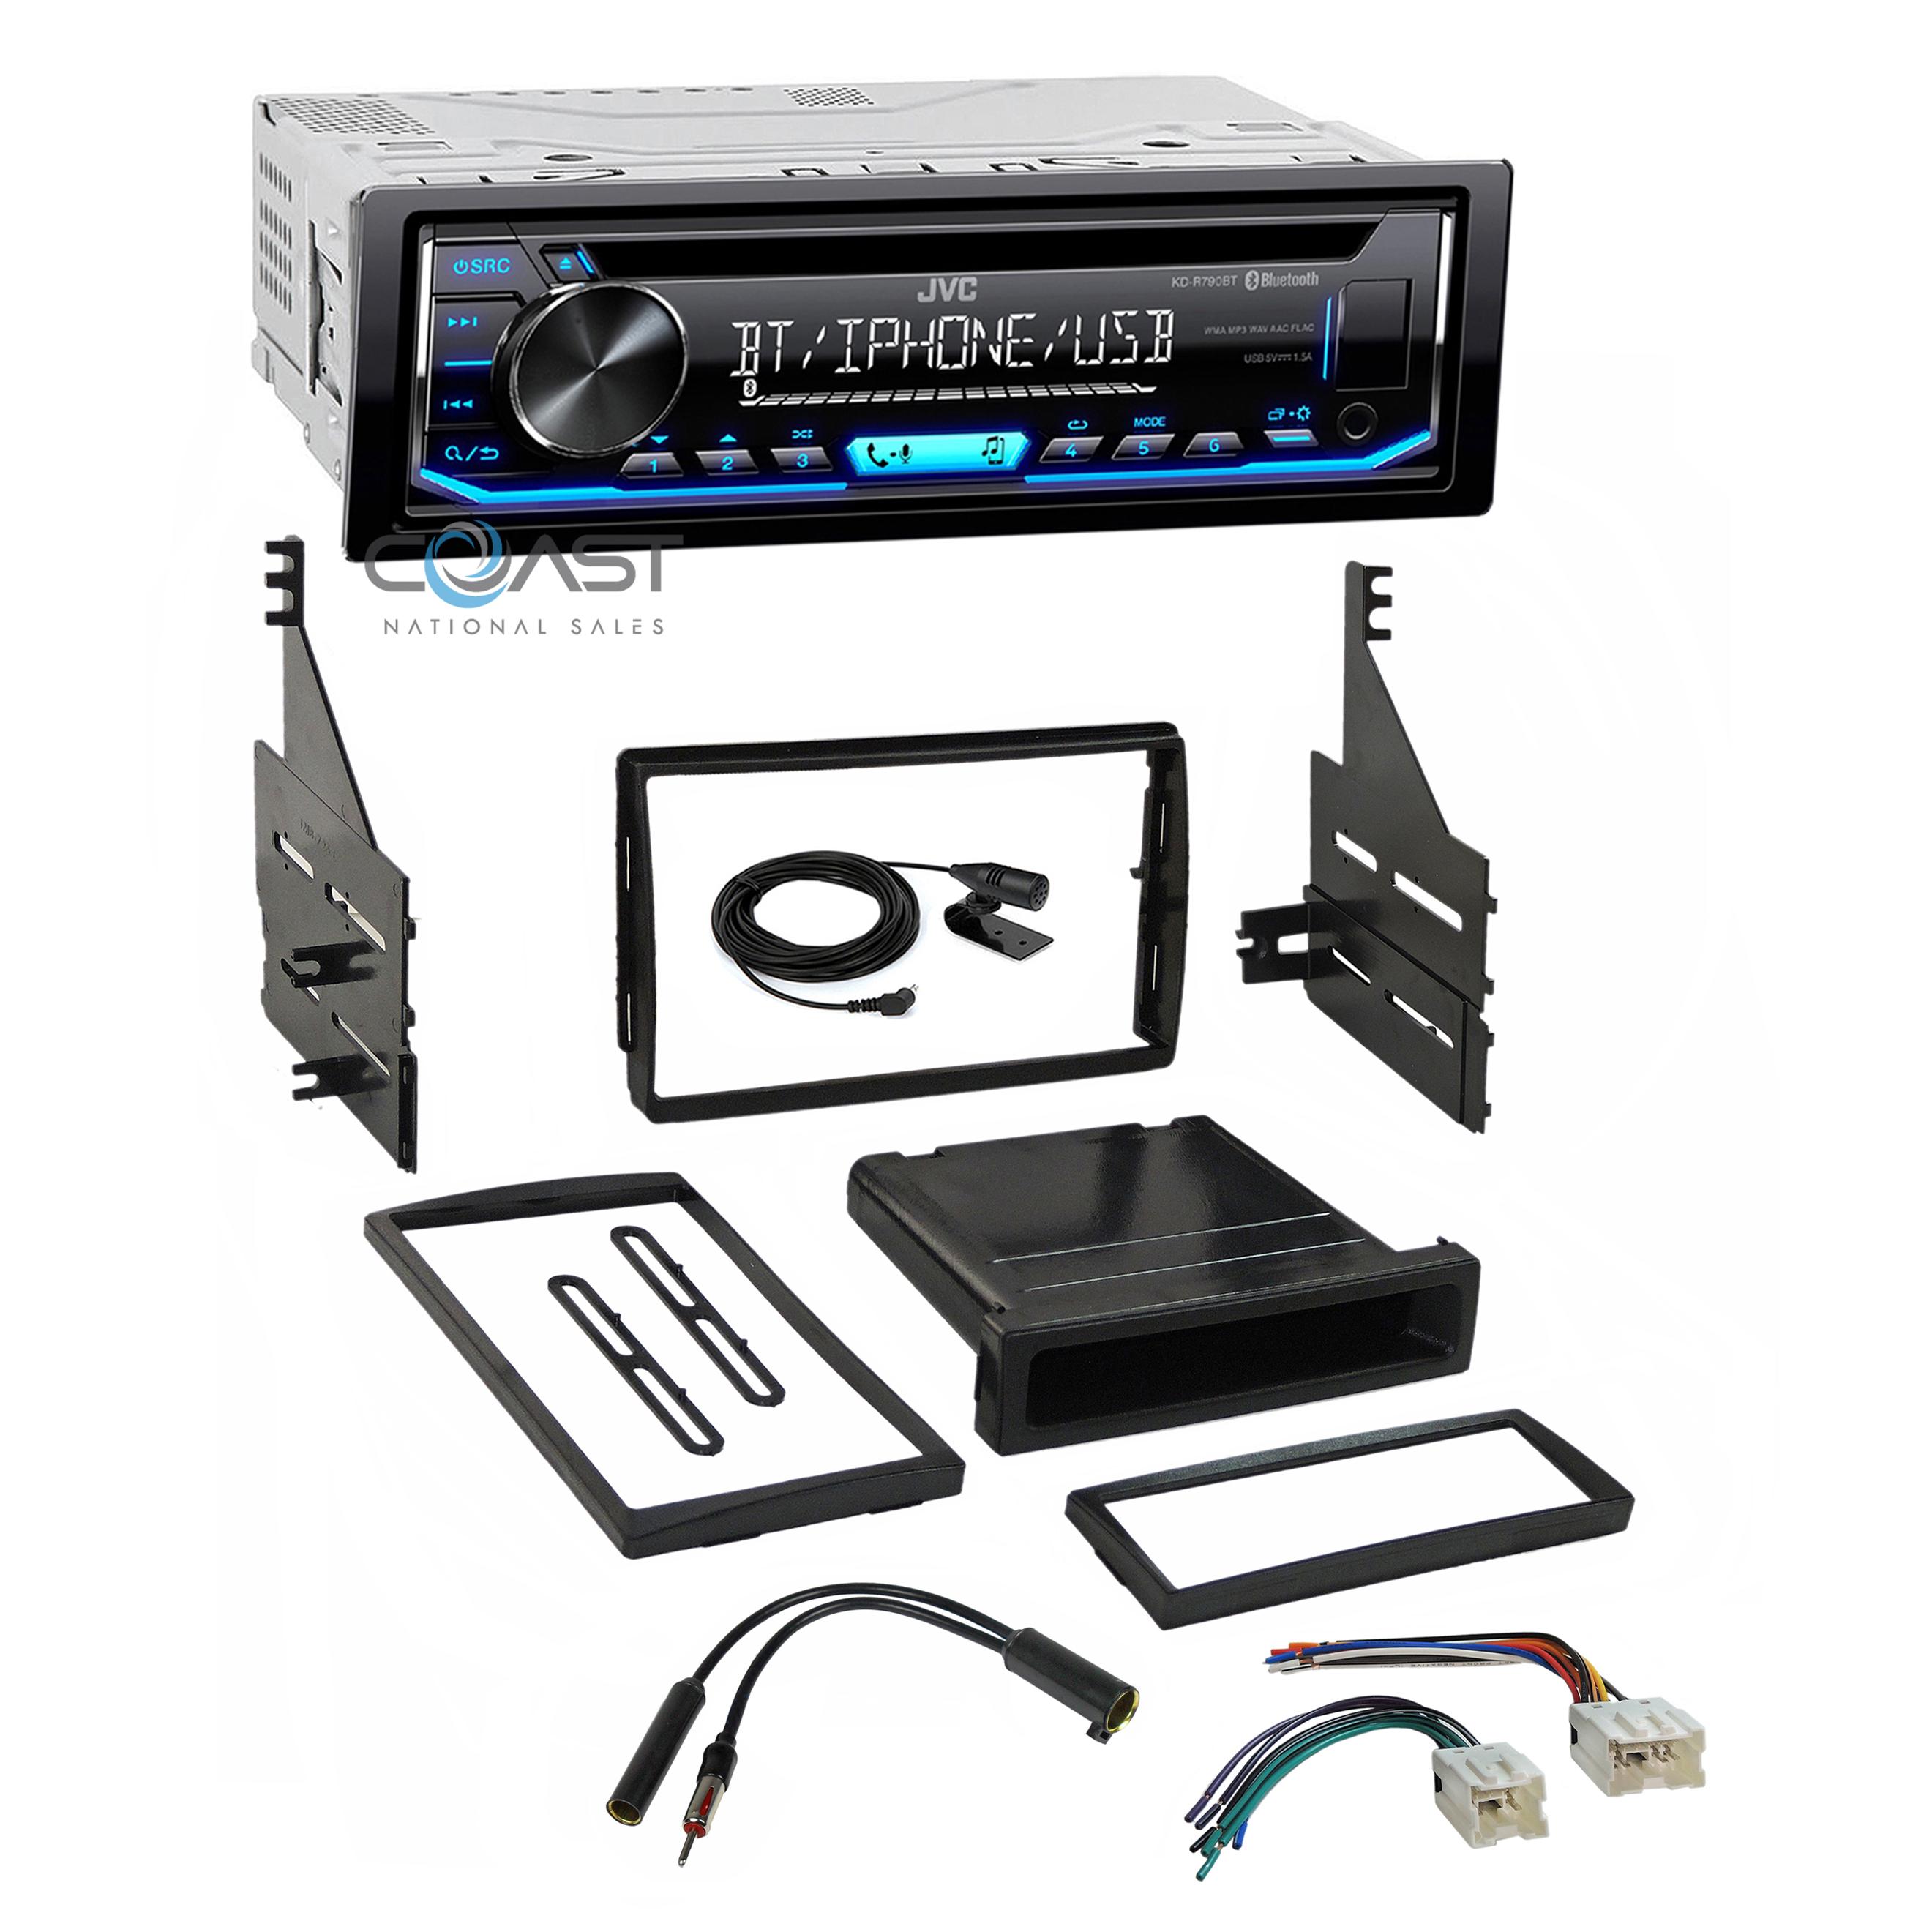 SCOSCHE NN1660B 2005-06 Nissan Altima Double DIN Install Dash Kit